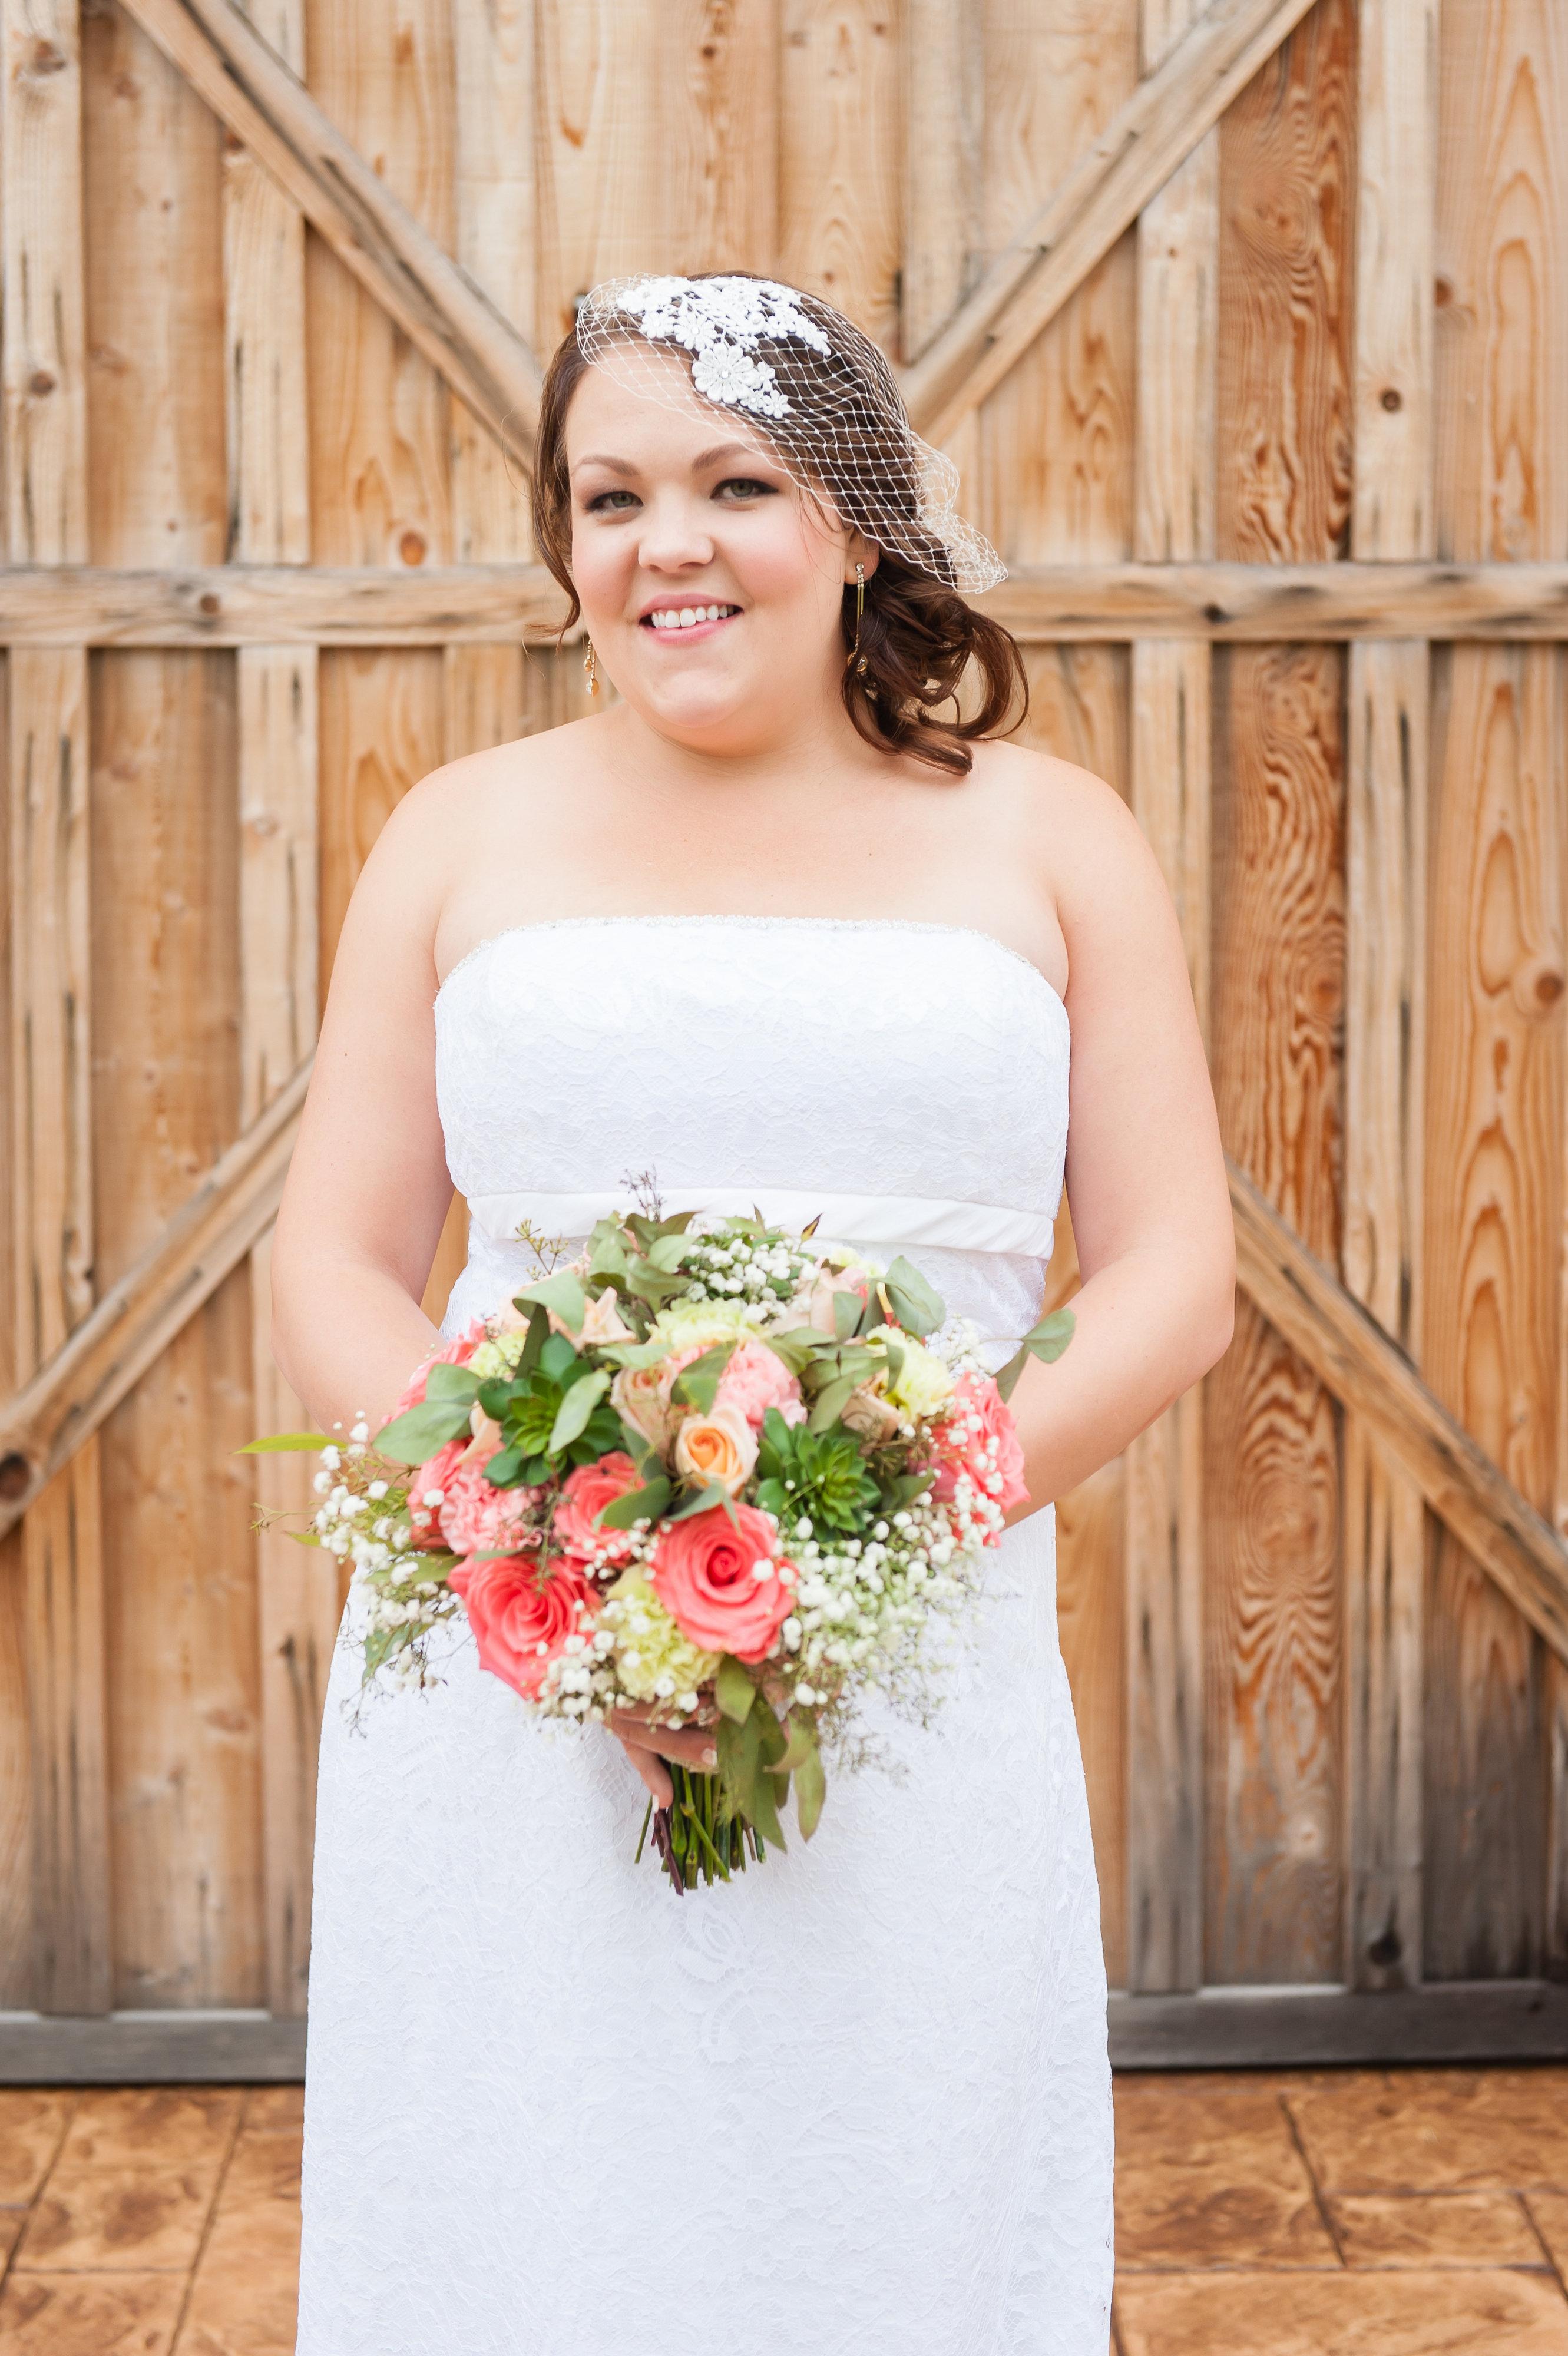 Our divine bride!